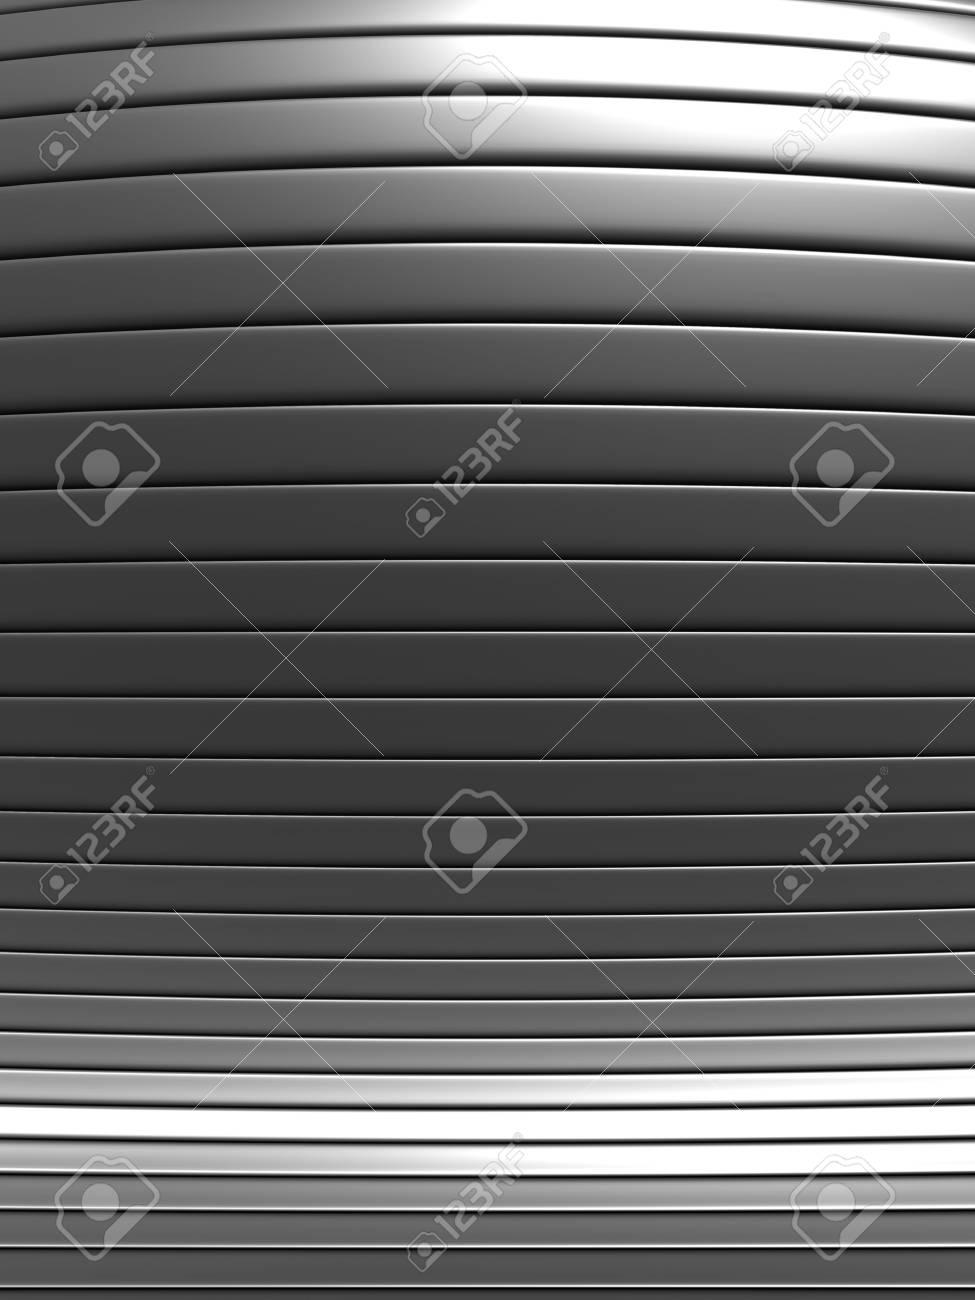 Aluminum abstract silver pattern background 3d illustration Stock Illustration - 7922687